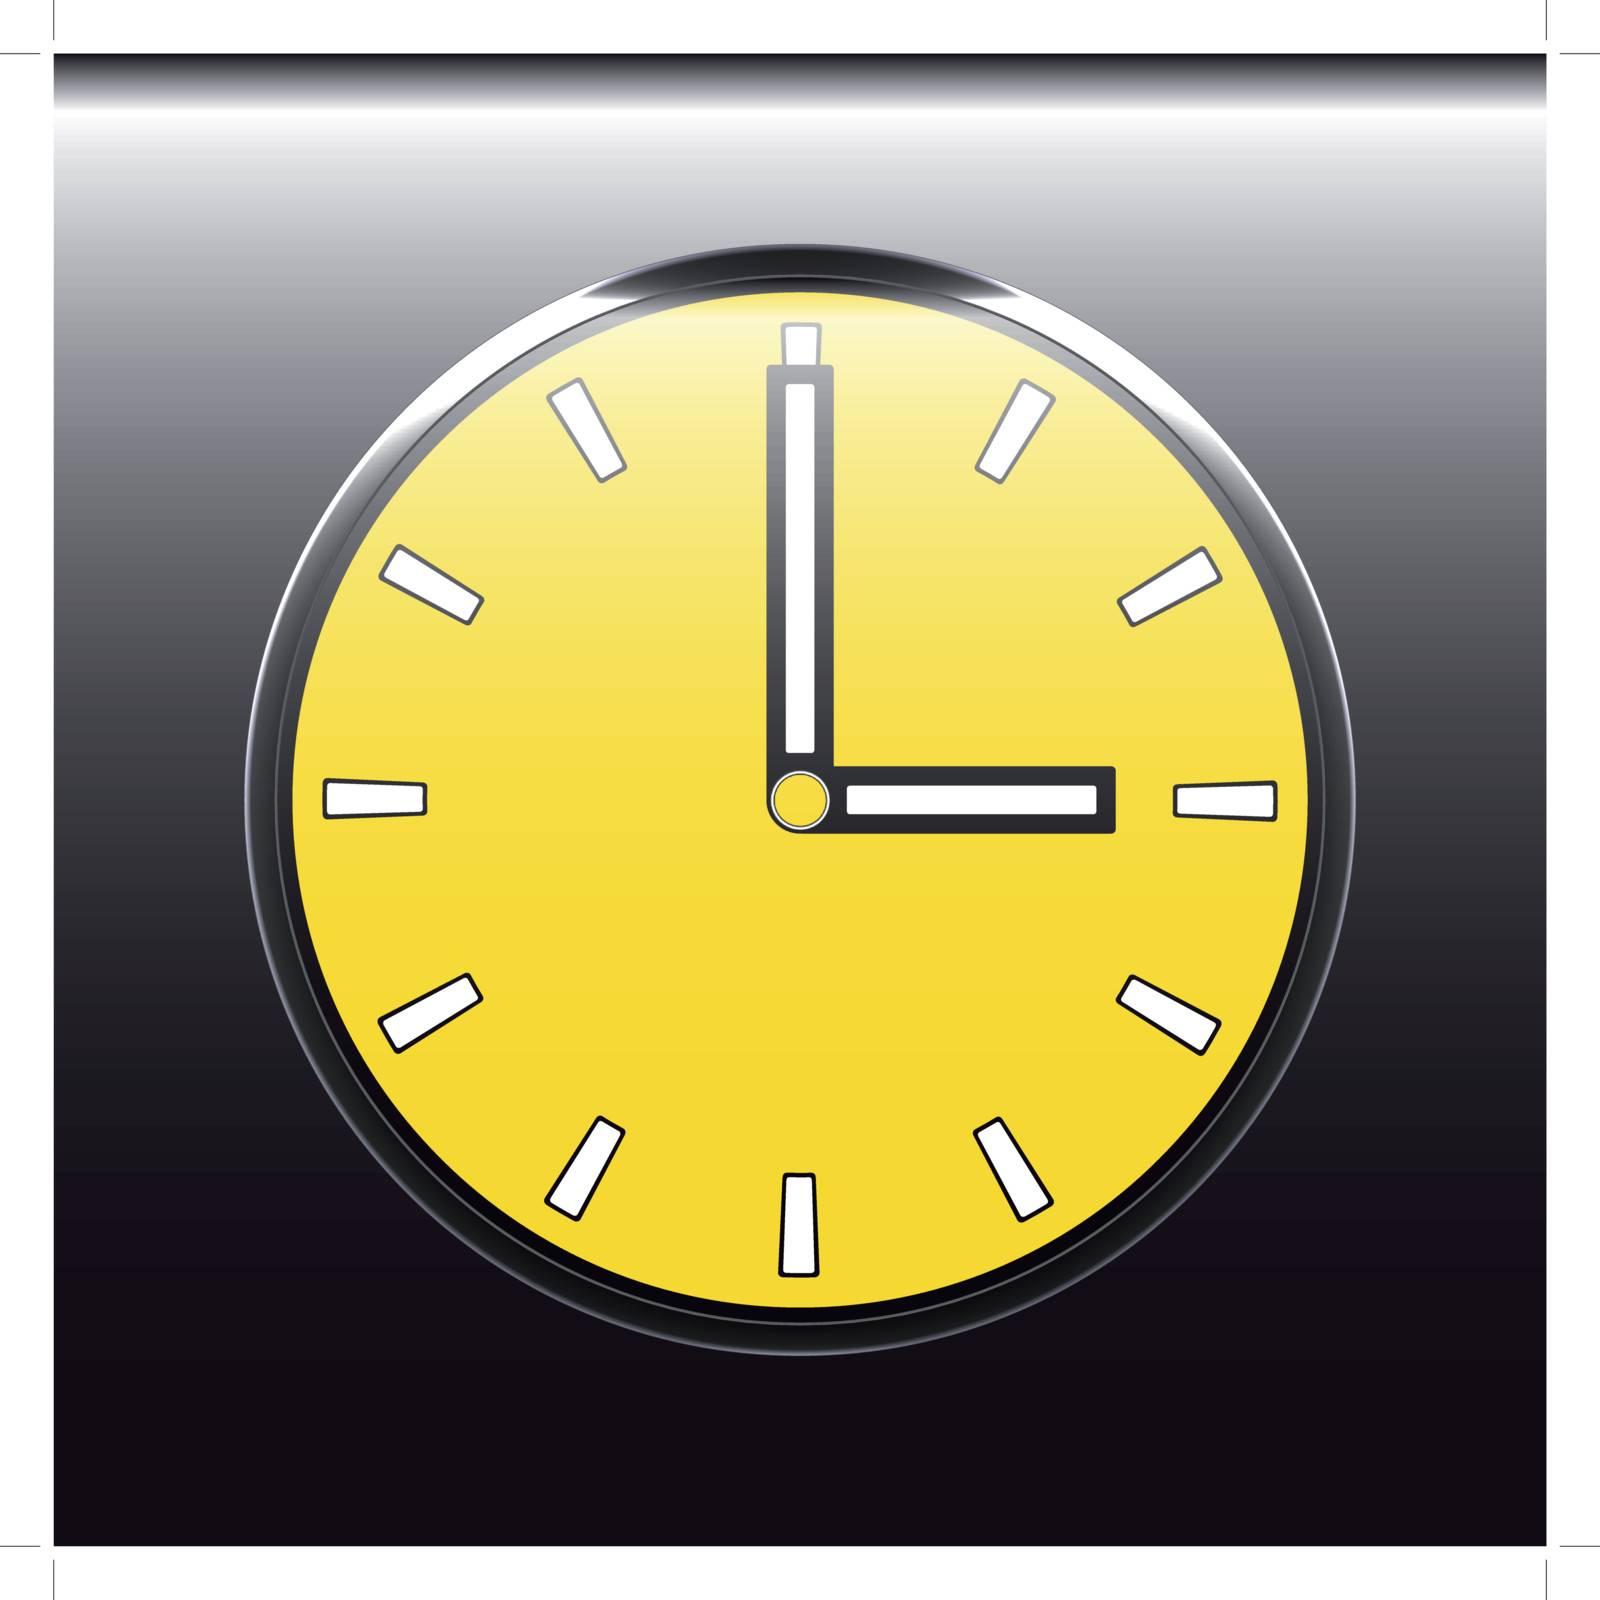 beautiful yellow clock round shape on a black background